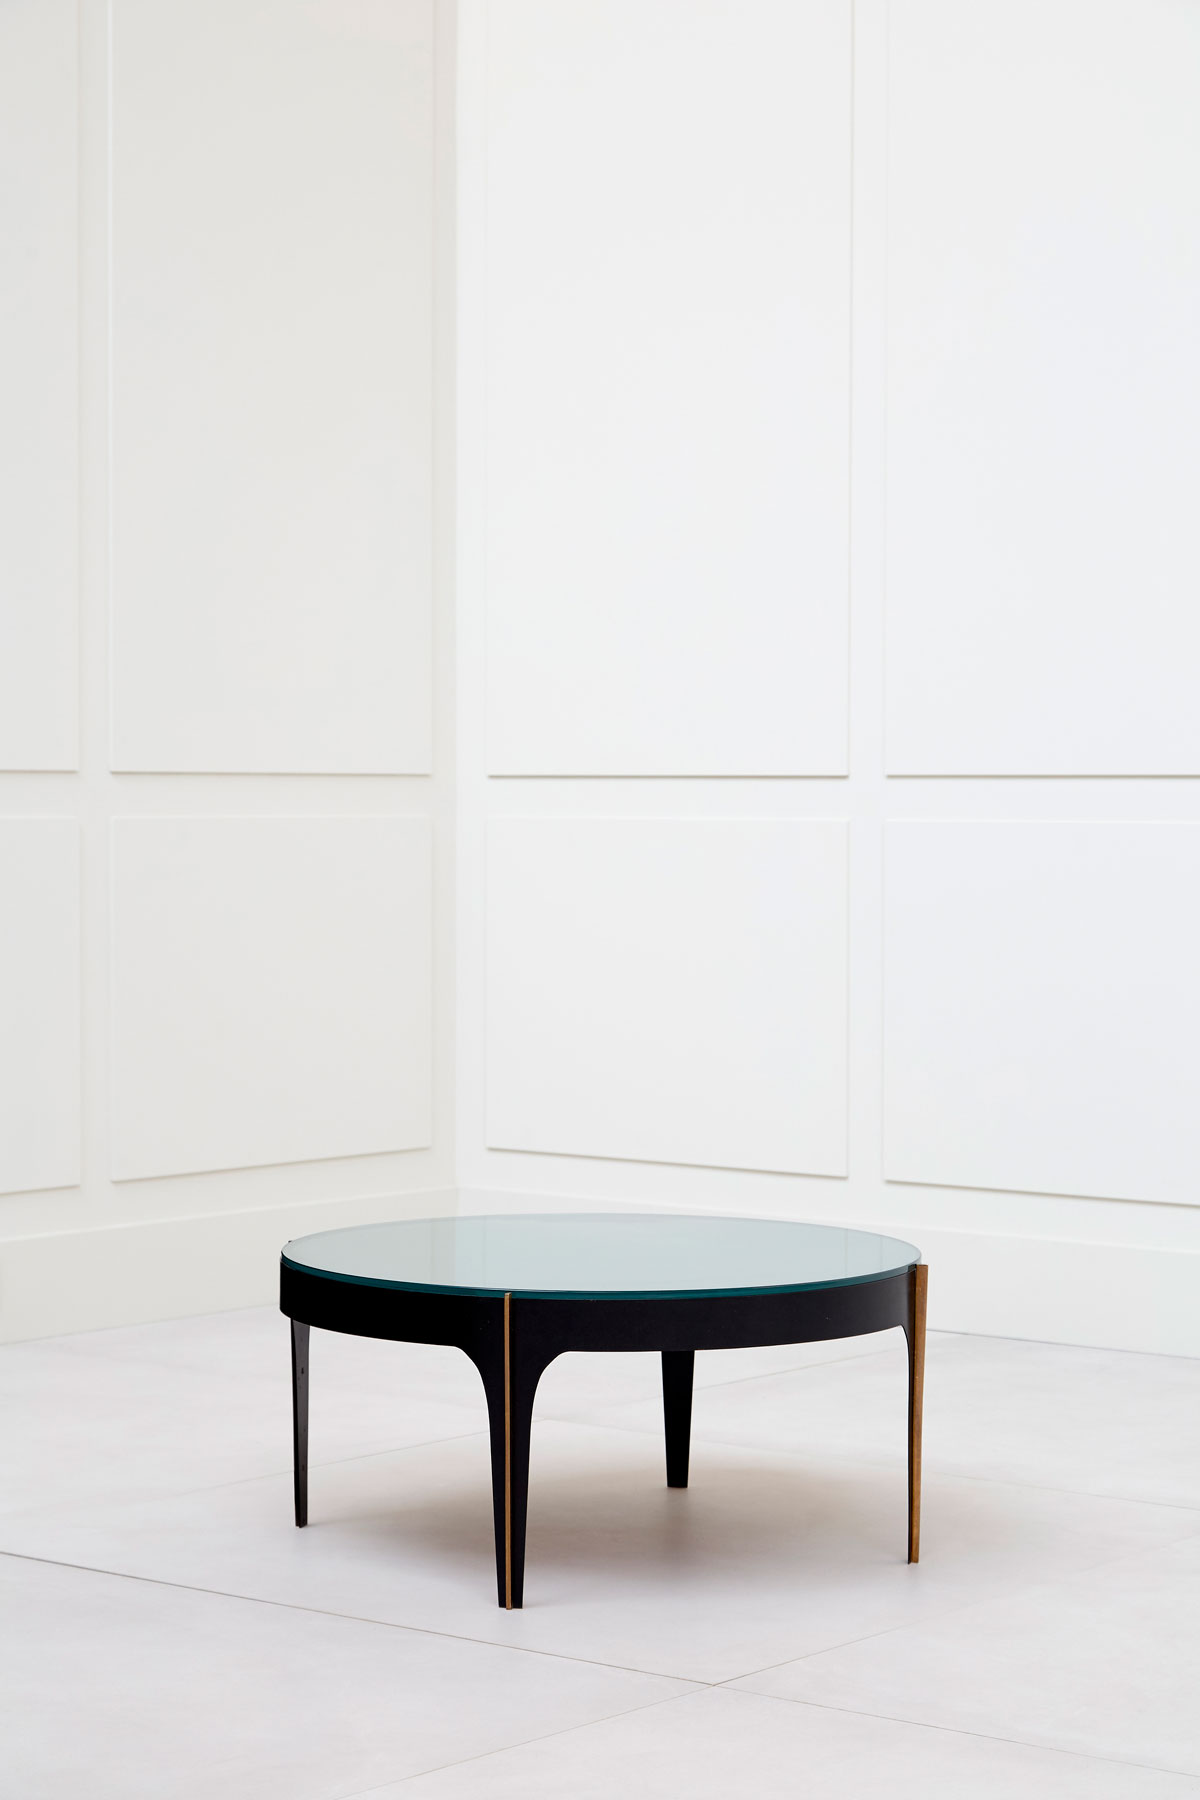 Max Ingrand & Fontana Arte, Table basse modèle 1774, vue 01